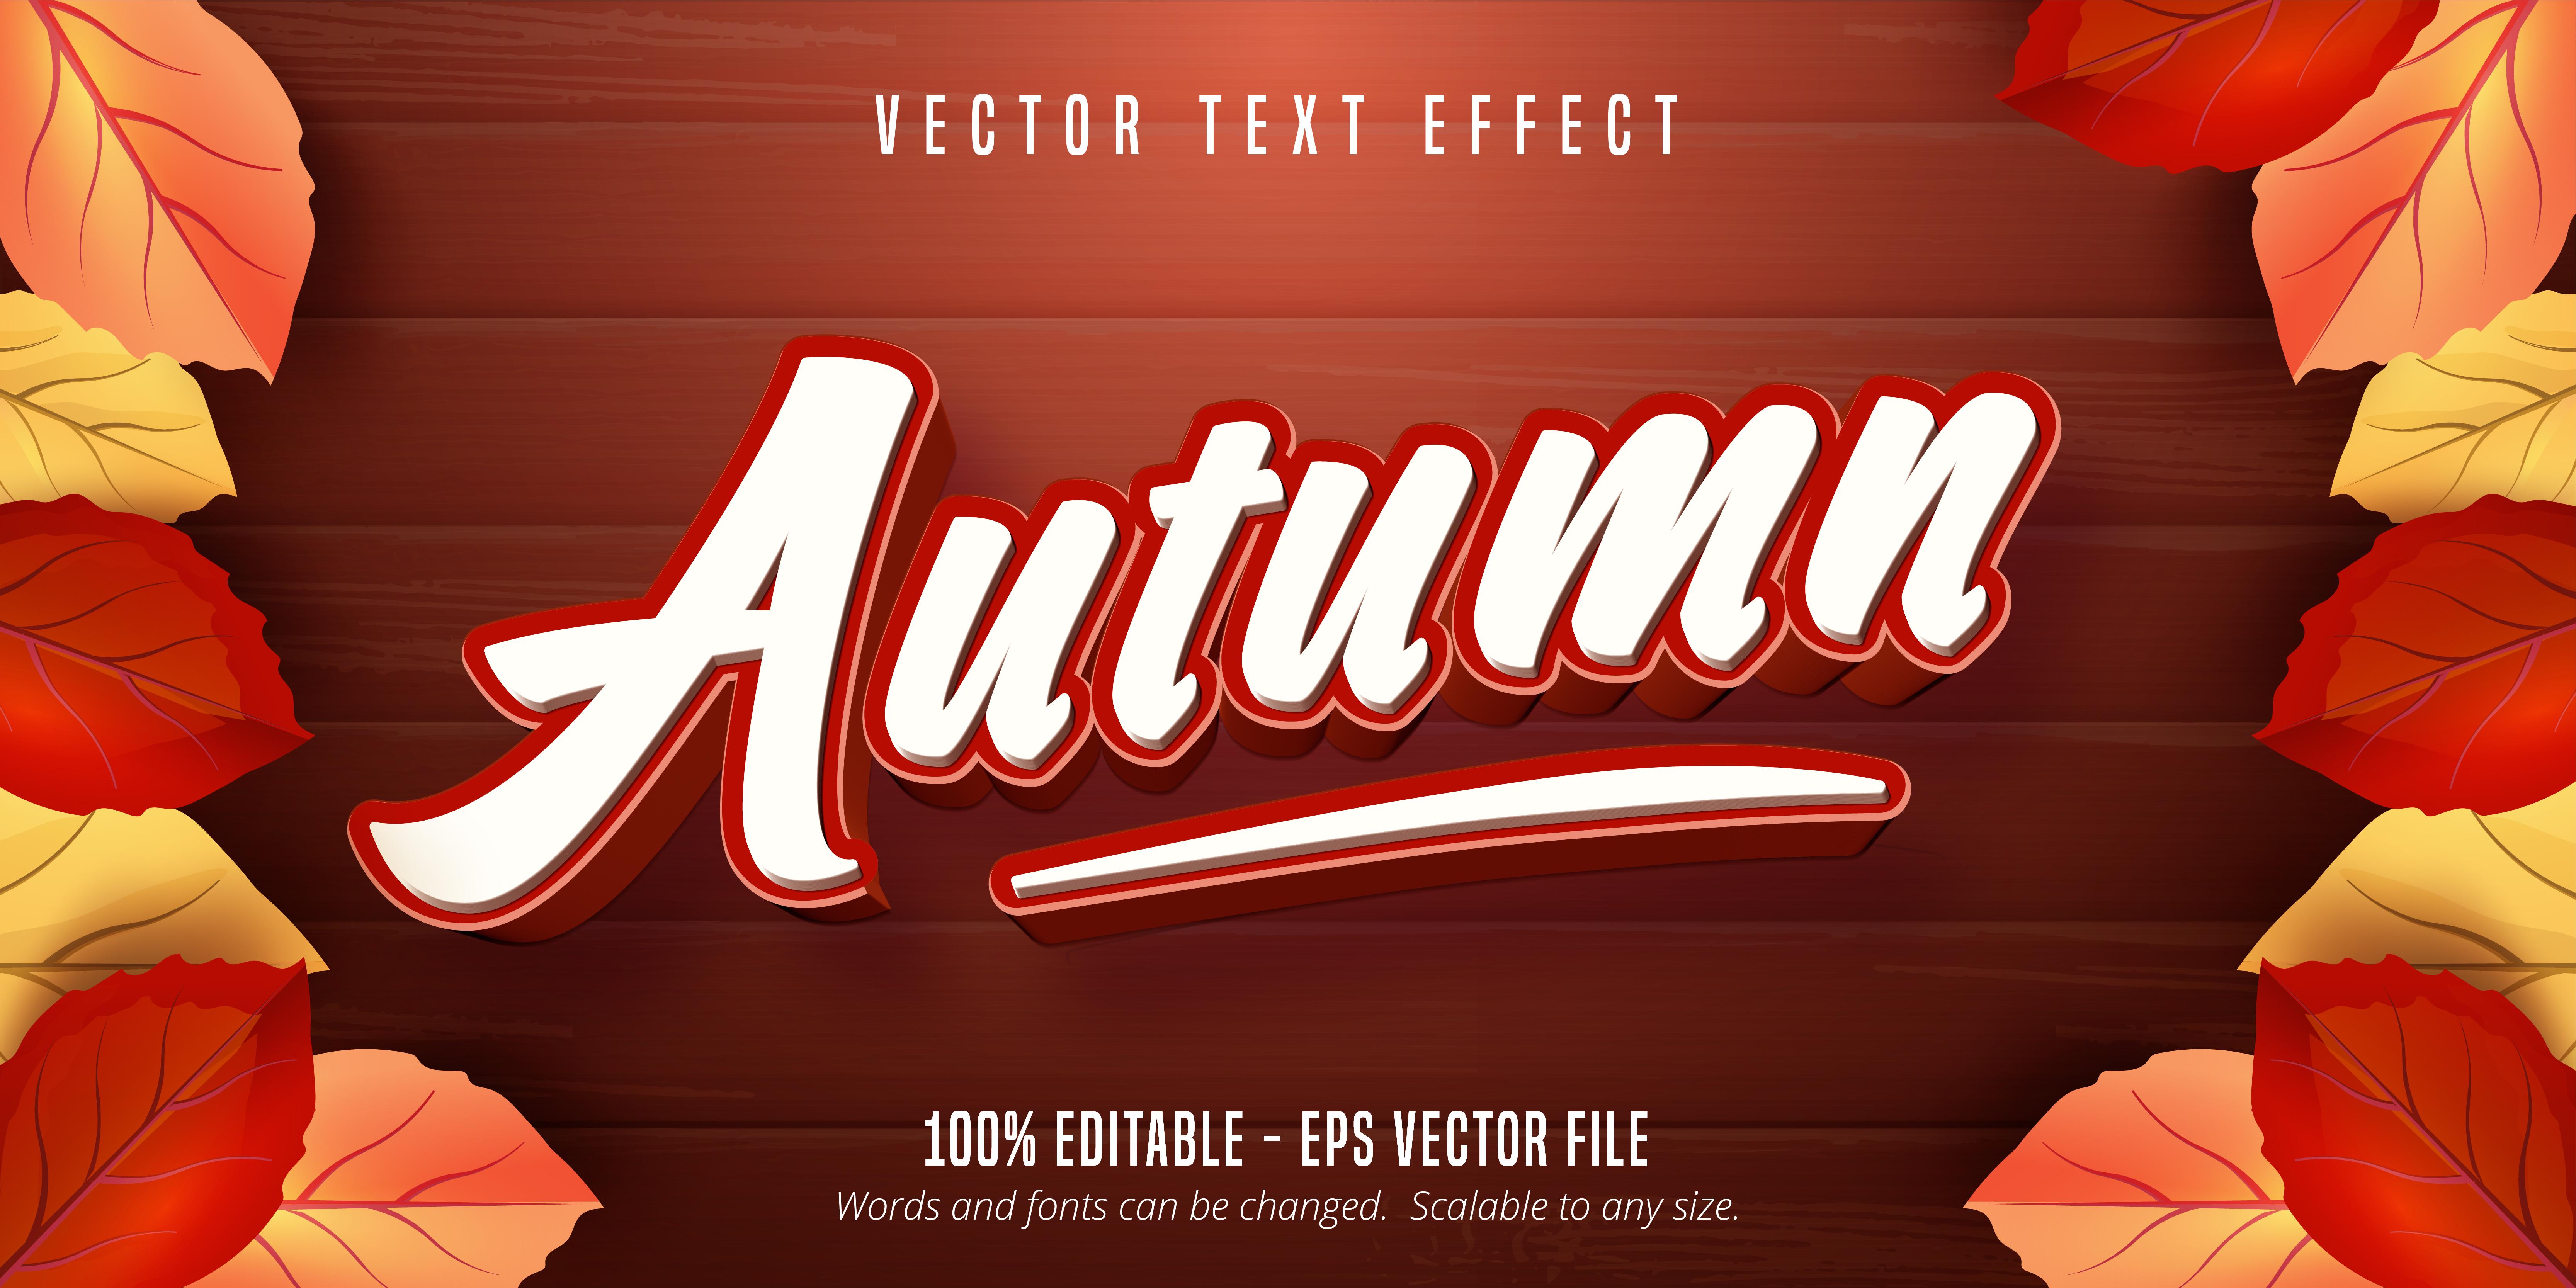 Autumn Text Effect on Wooden Texture